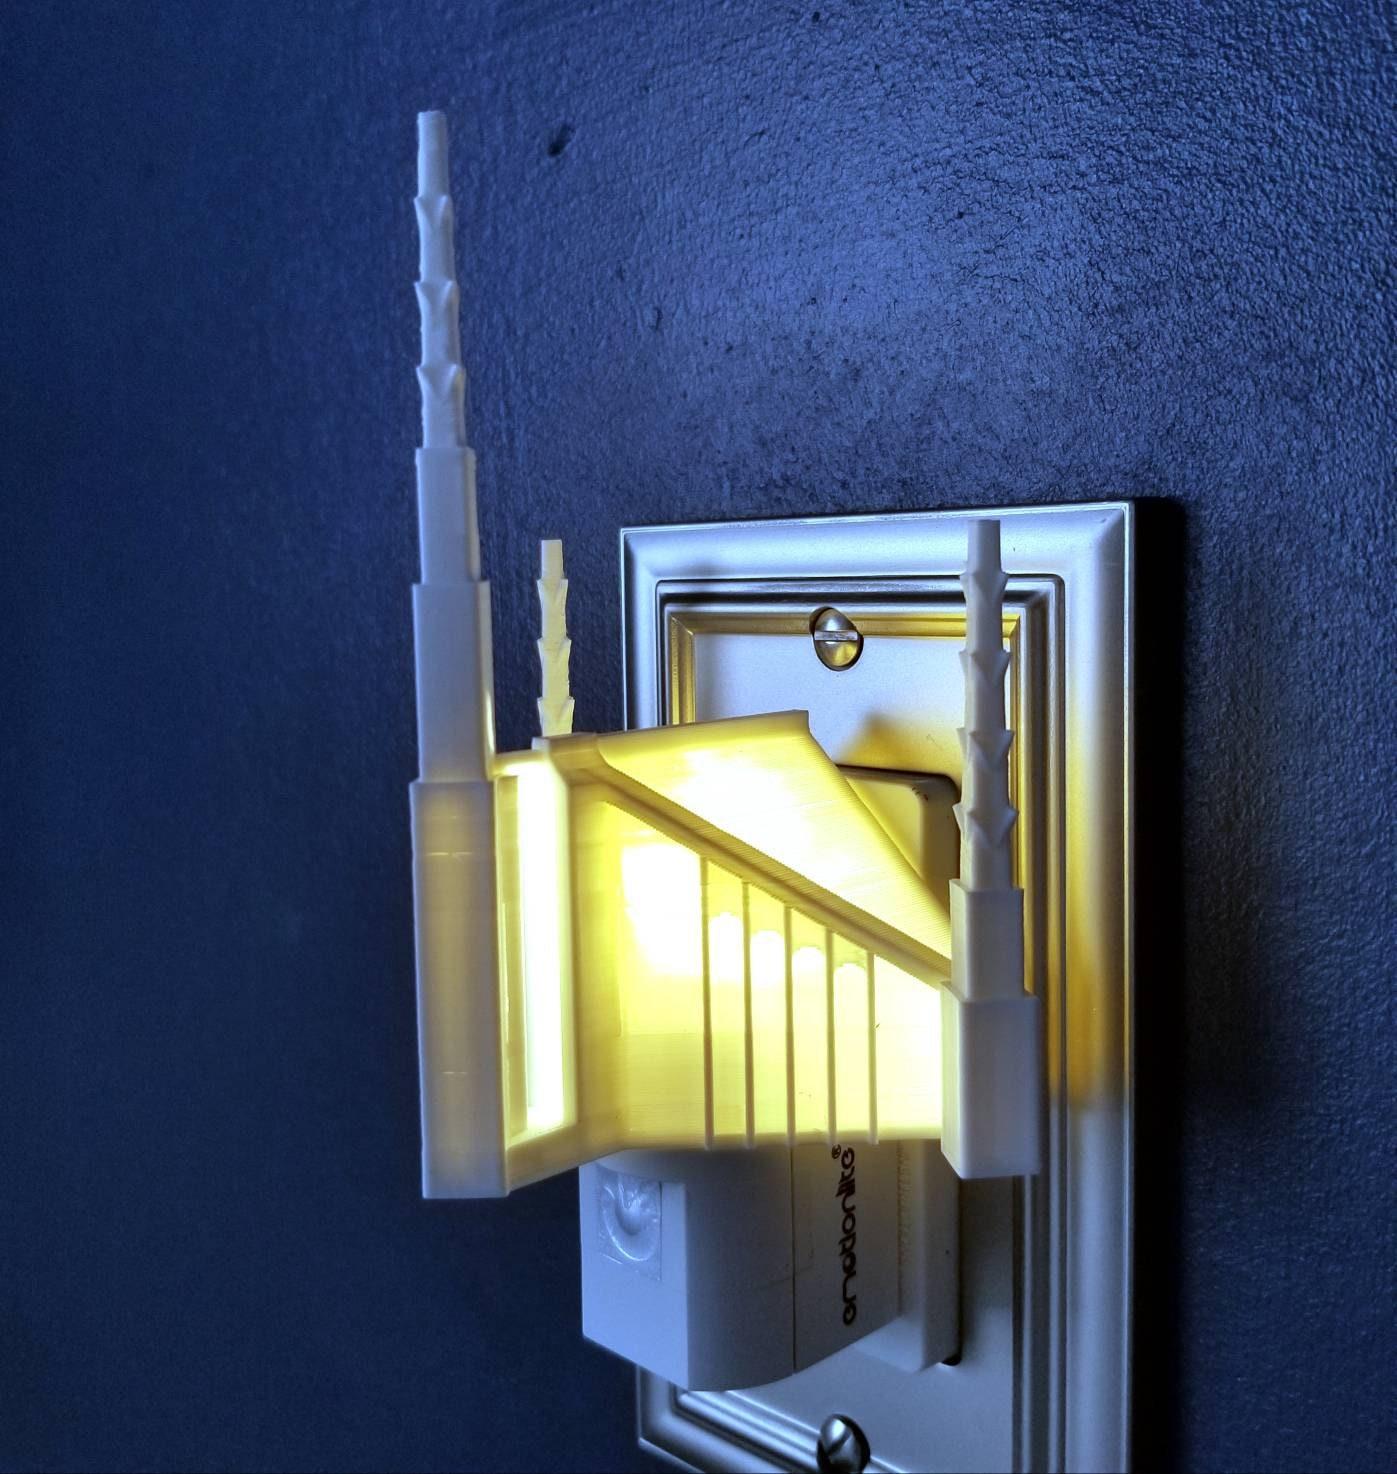 Oaxaca Mexico Temple Wall Night Light LED Plug-in LDS